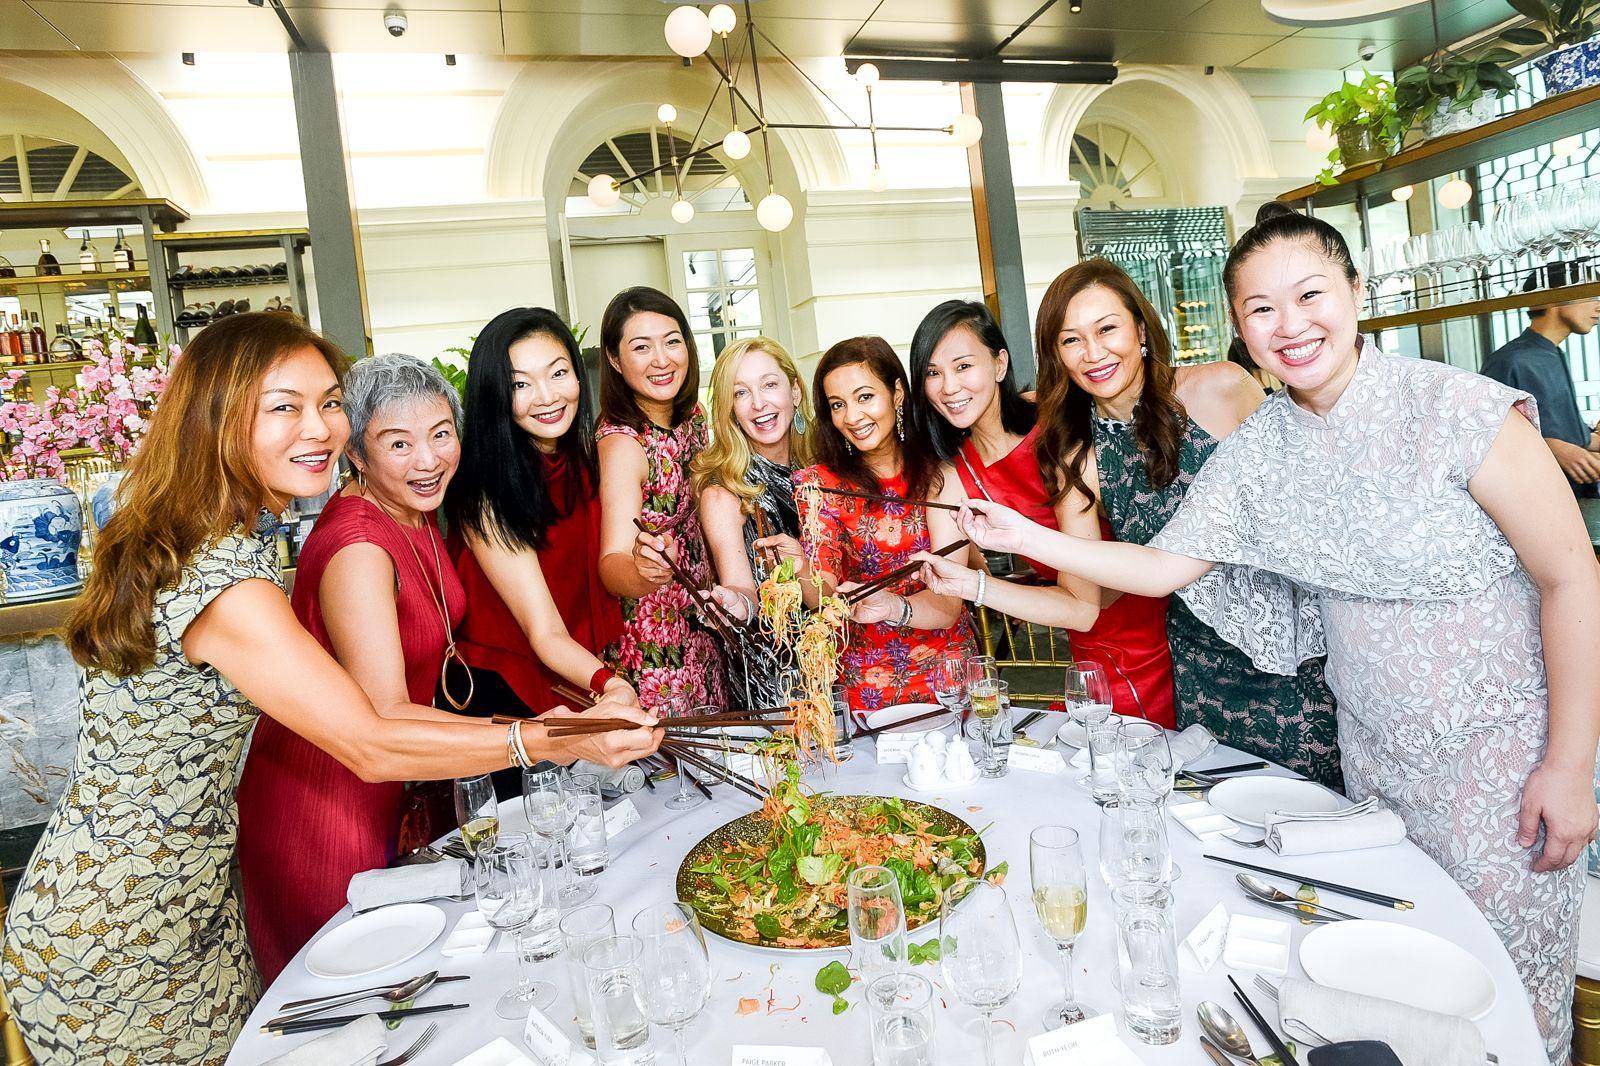 Patricia Yuen, Lim Chiwen, Maisy Koh, Nana Au-Chua, Paige Parker, Iroshini Chua, Lynn Yeow-De Vito, Trina Liang-Lin, Ruth Yeoh